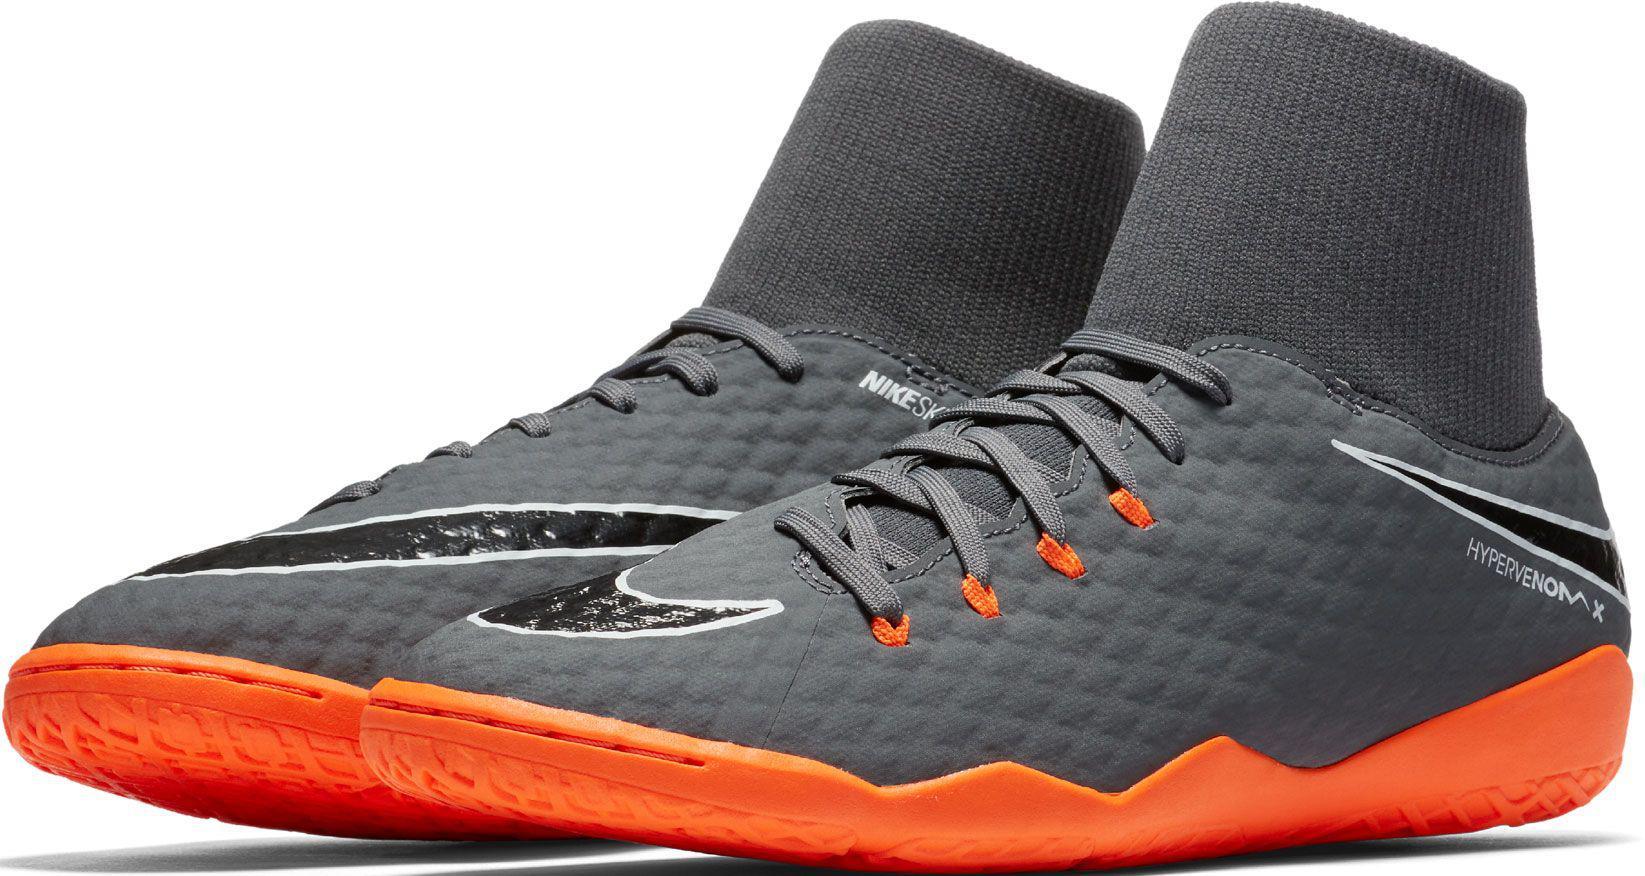 e70bf5ab98 Lyst - Nike Hypervenom Phantomx 3 Academy Dynamic Fit Indoor Soccer ...